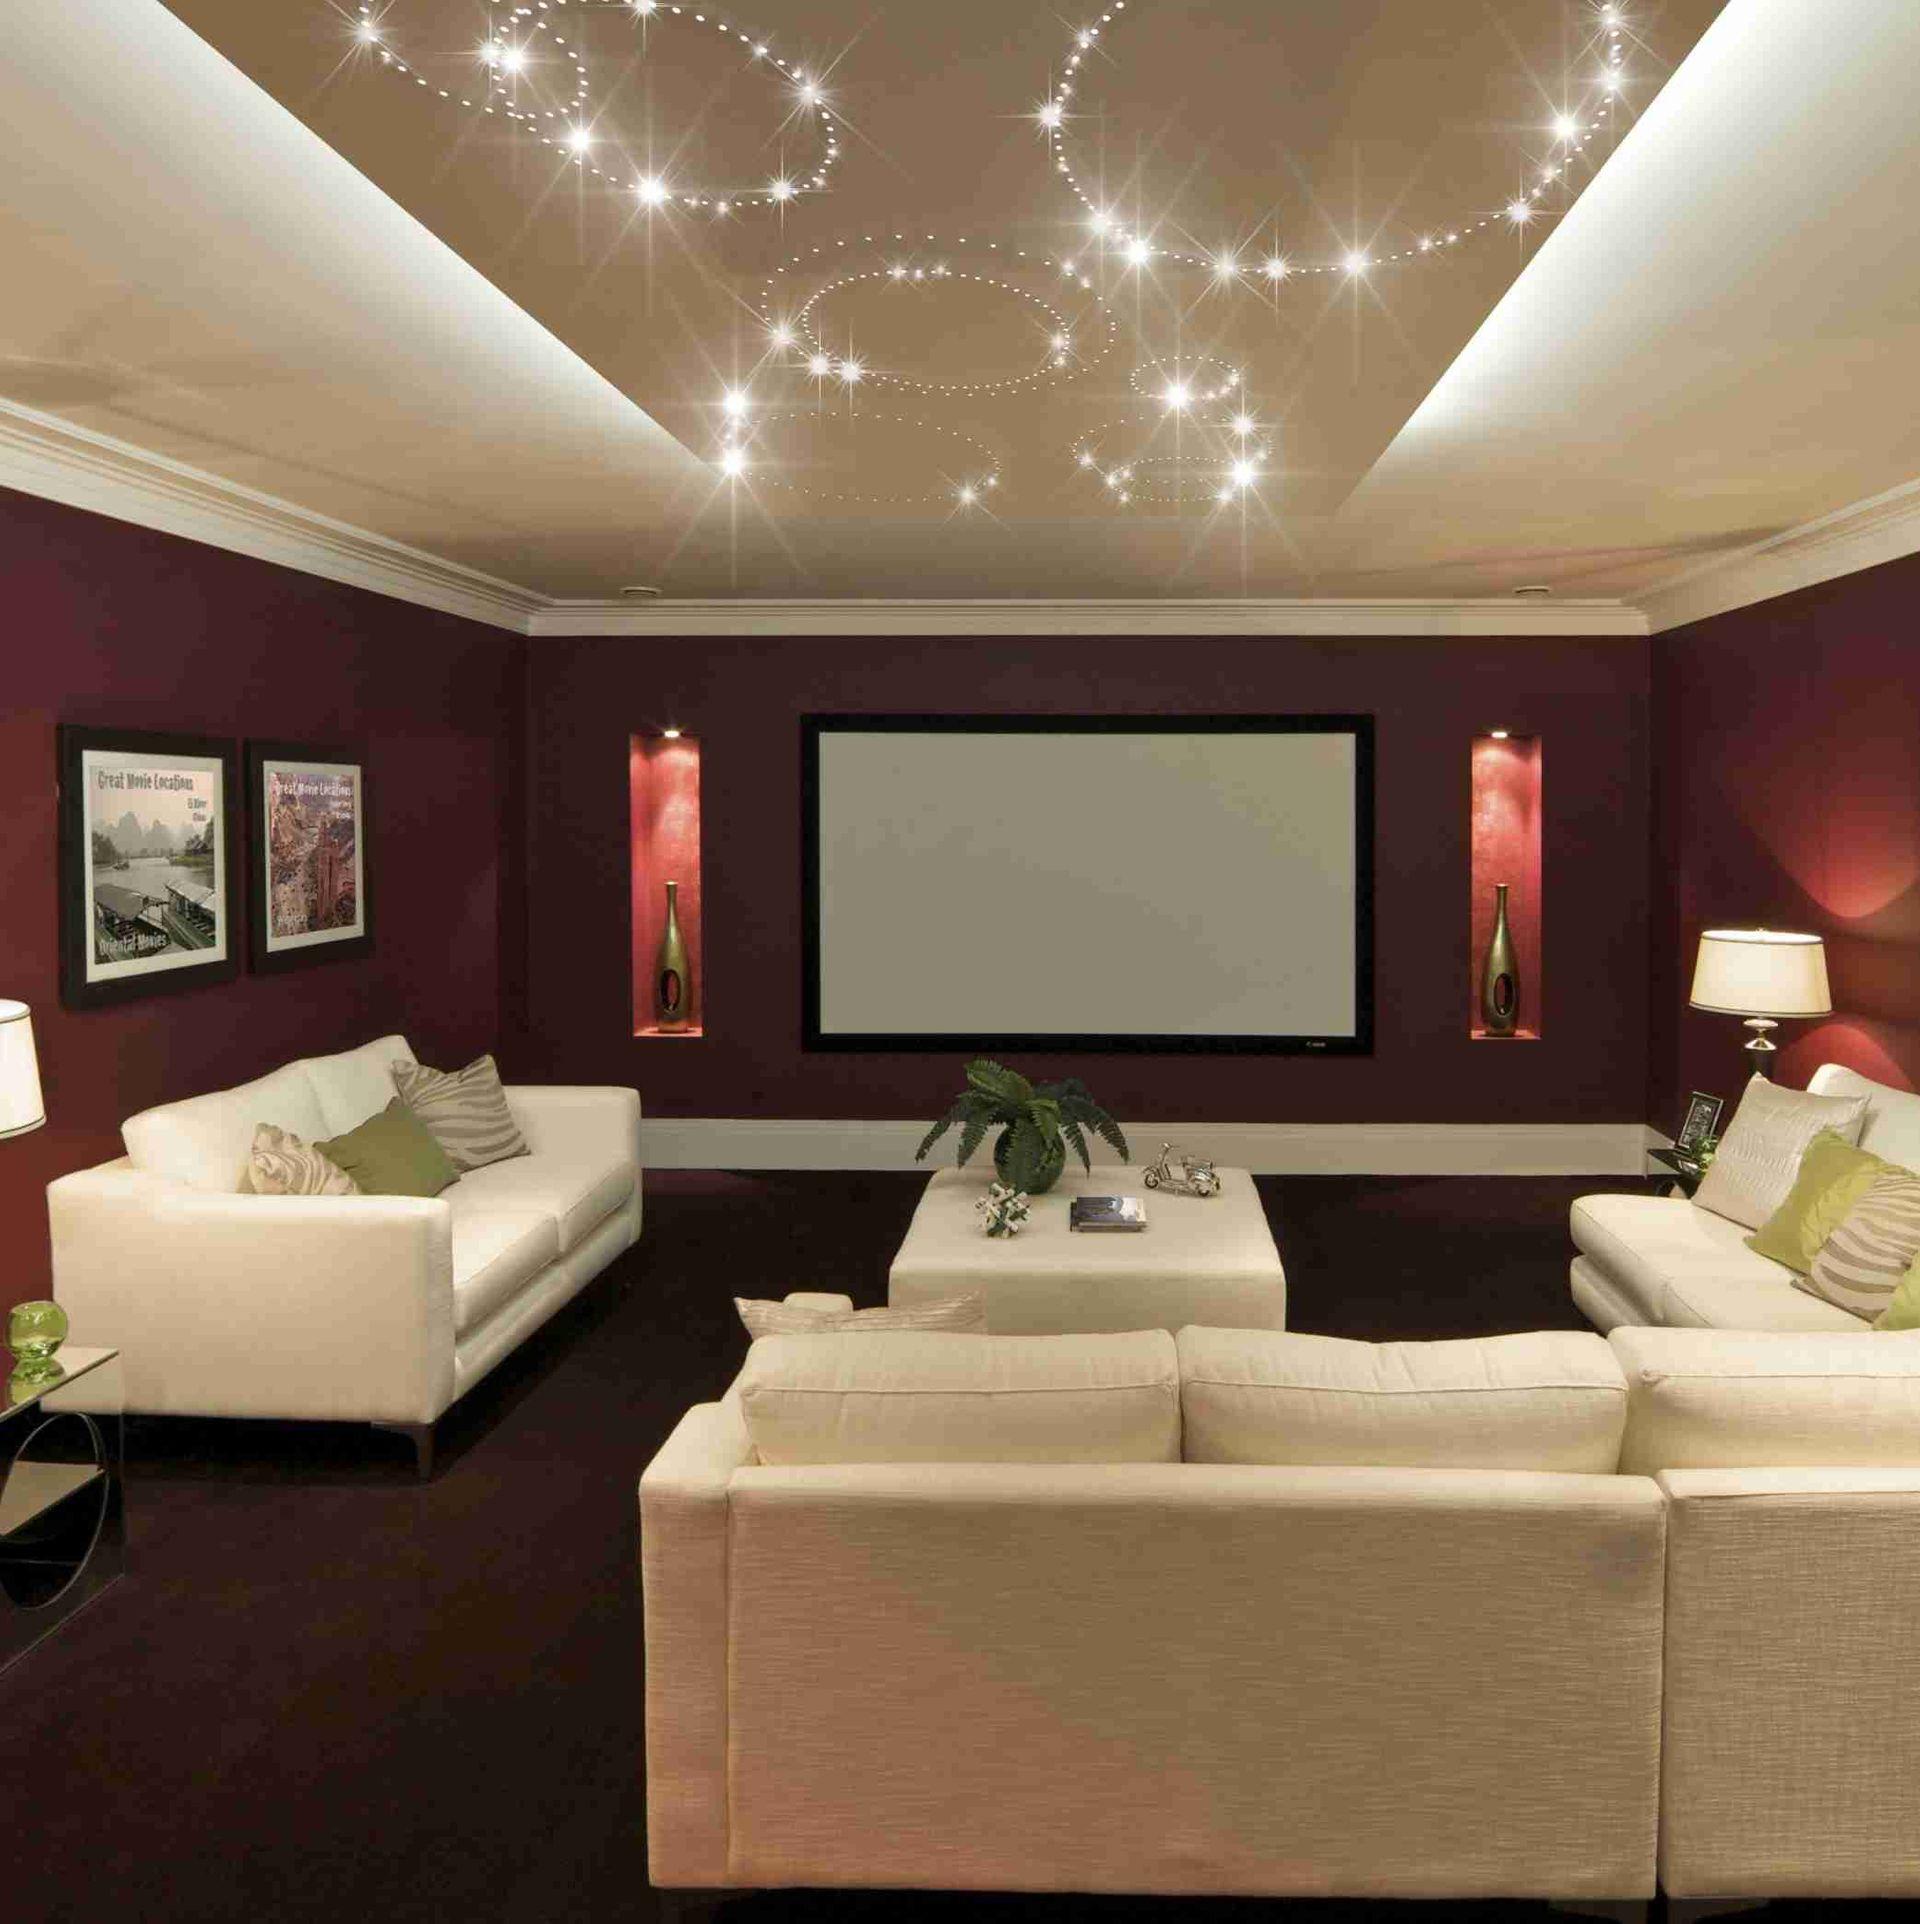 Die PIXLUM LED Sternenhimmel Bildergalerie